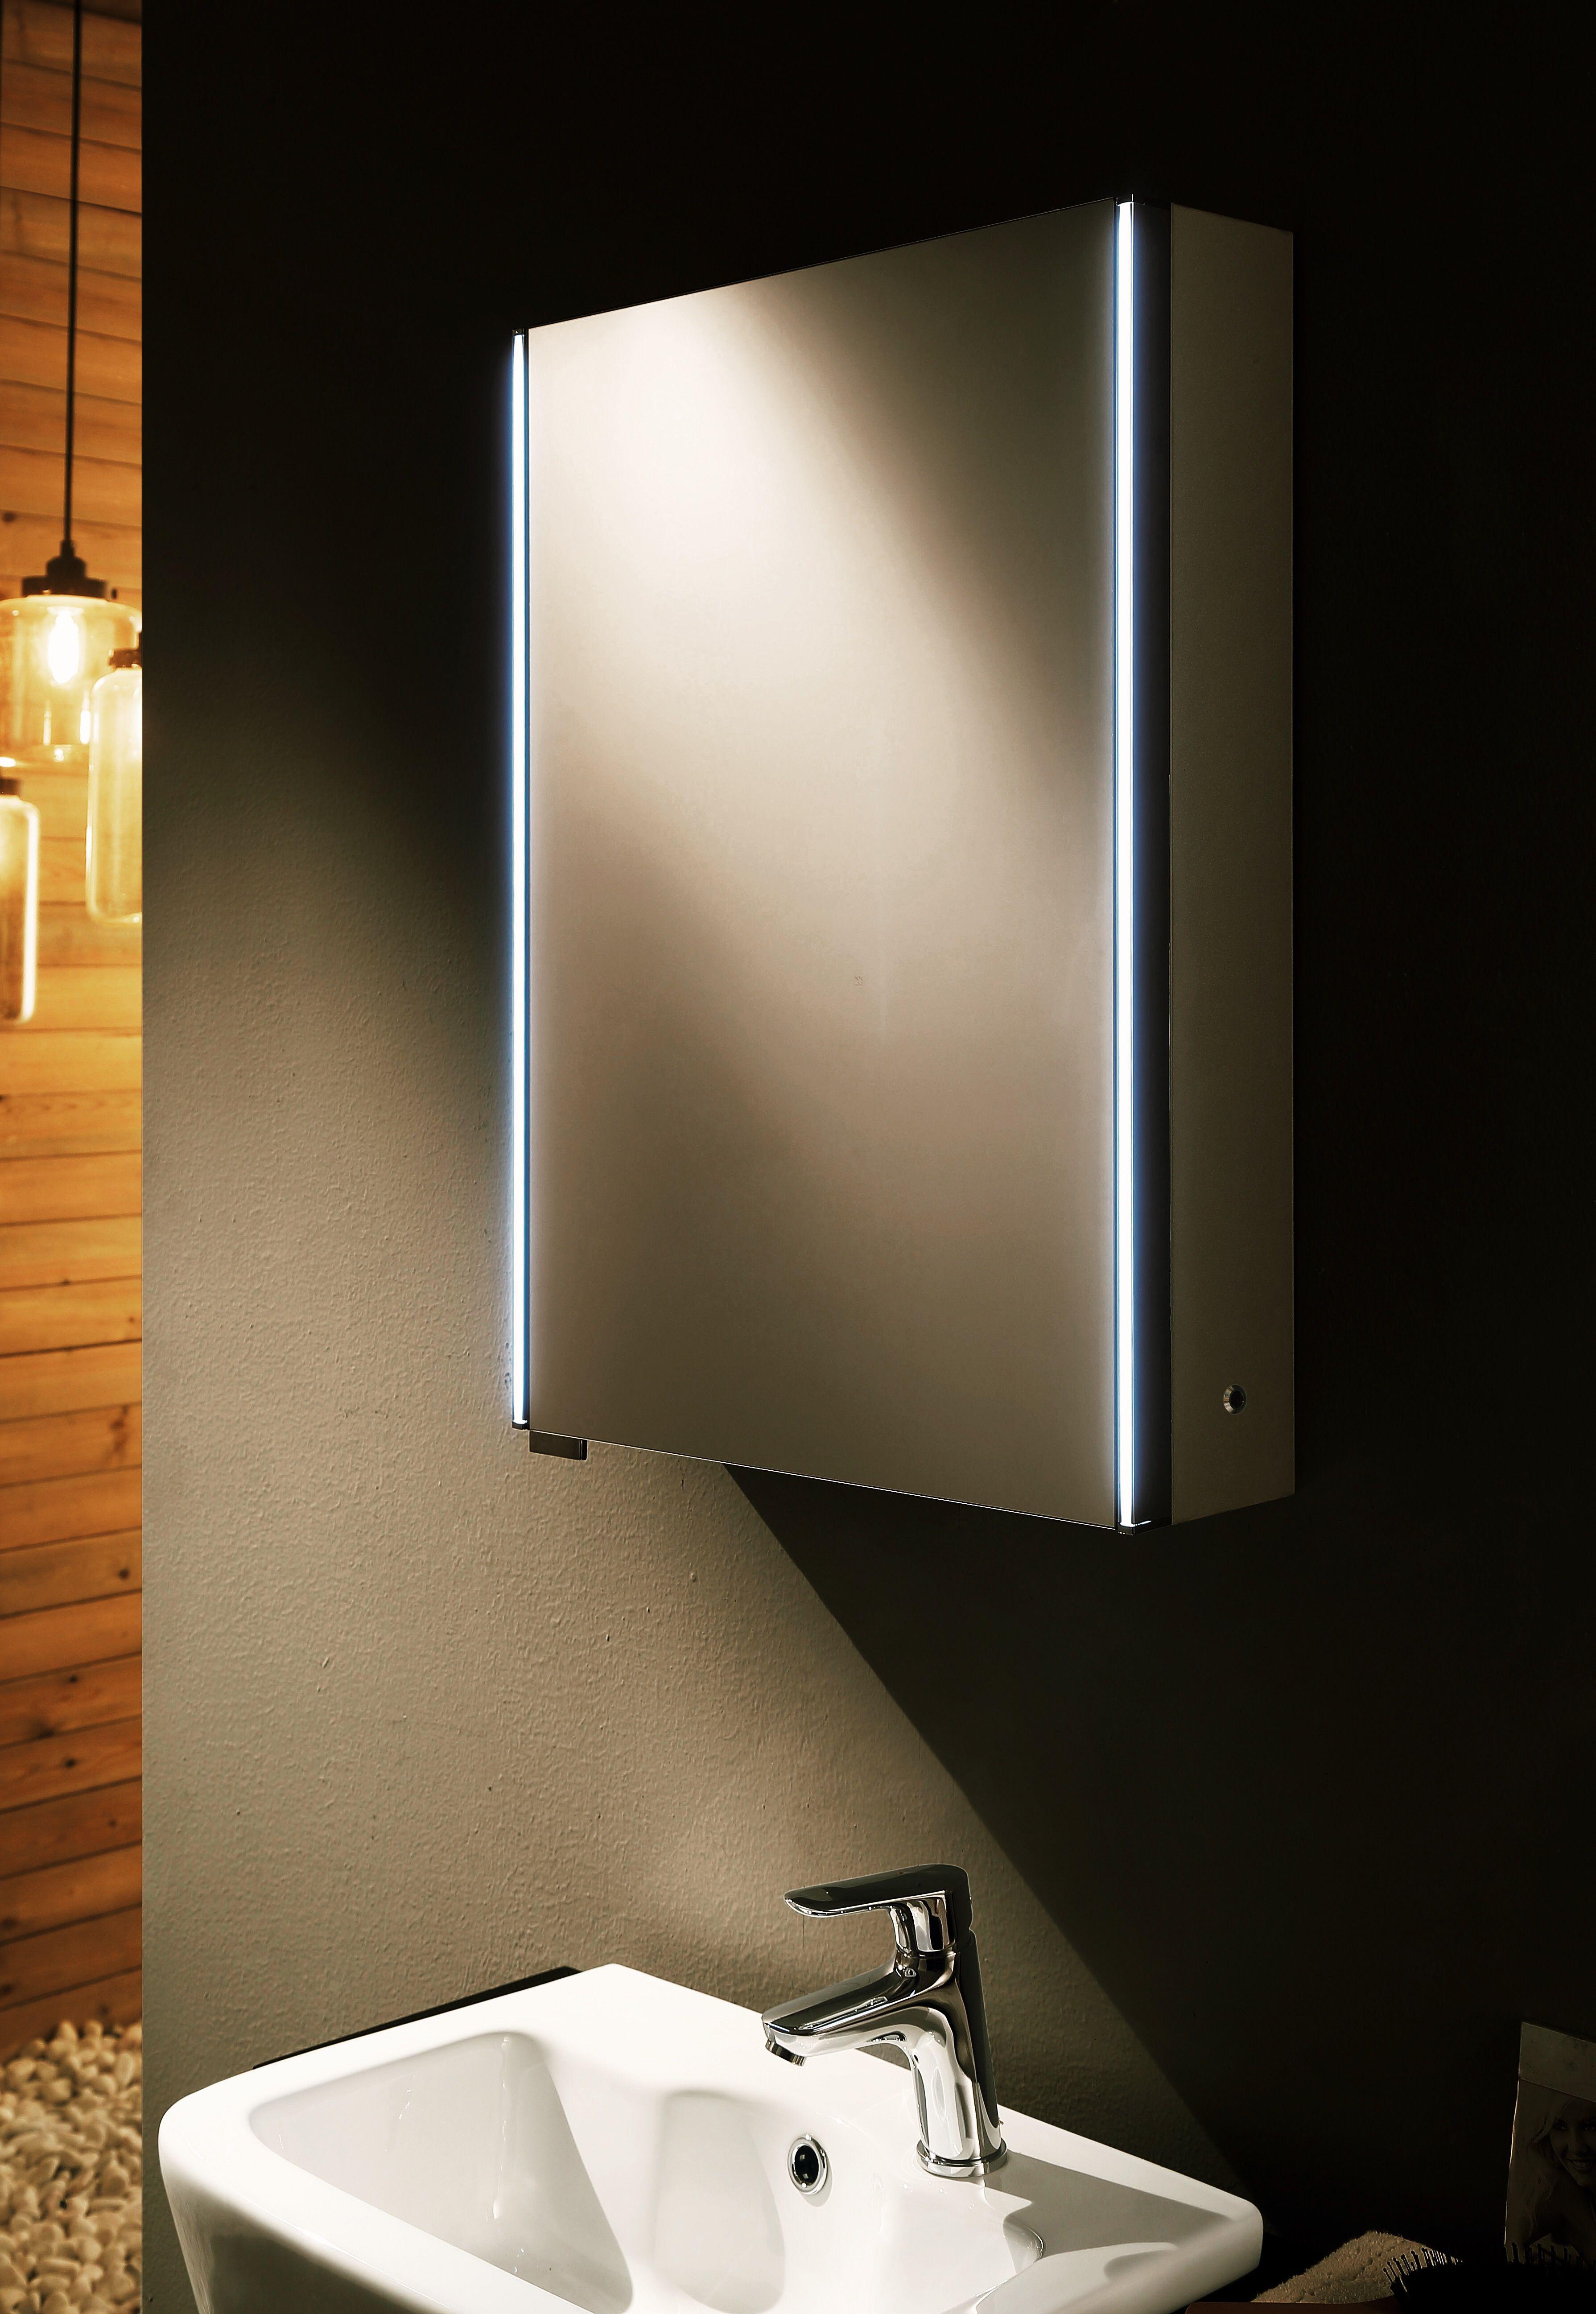 Led Illuminated Bathroom Mirror With